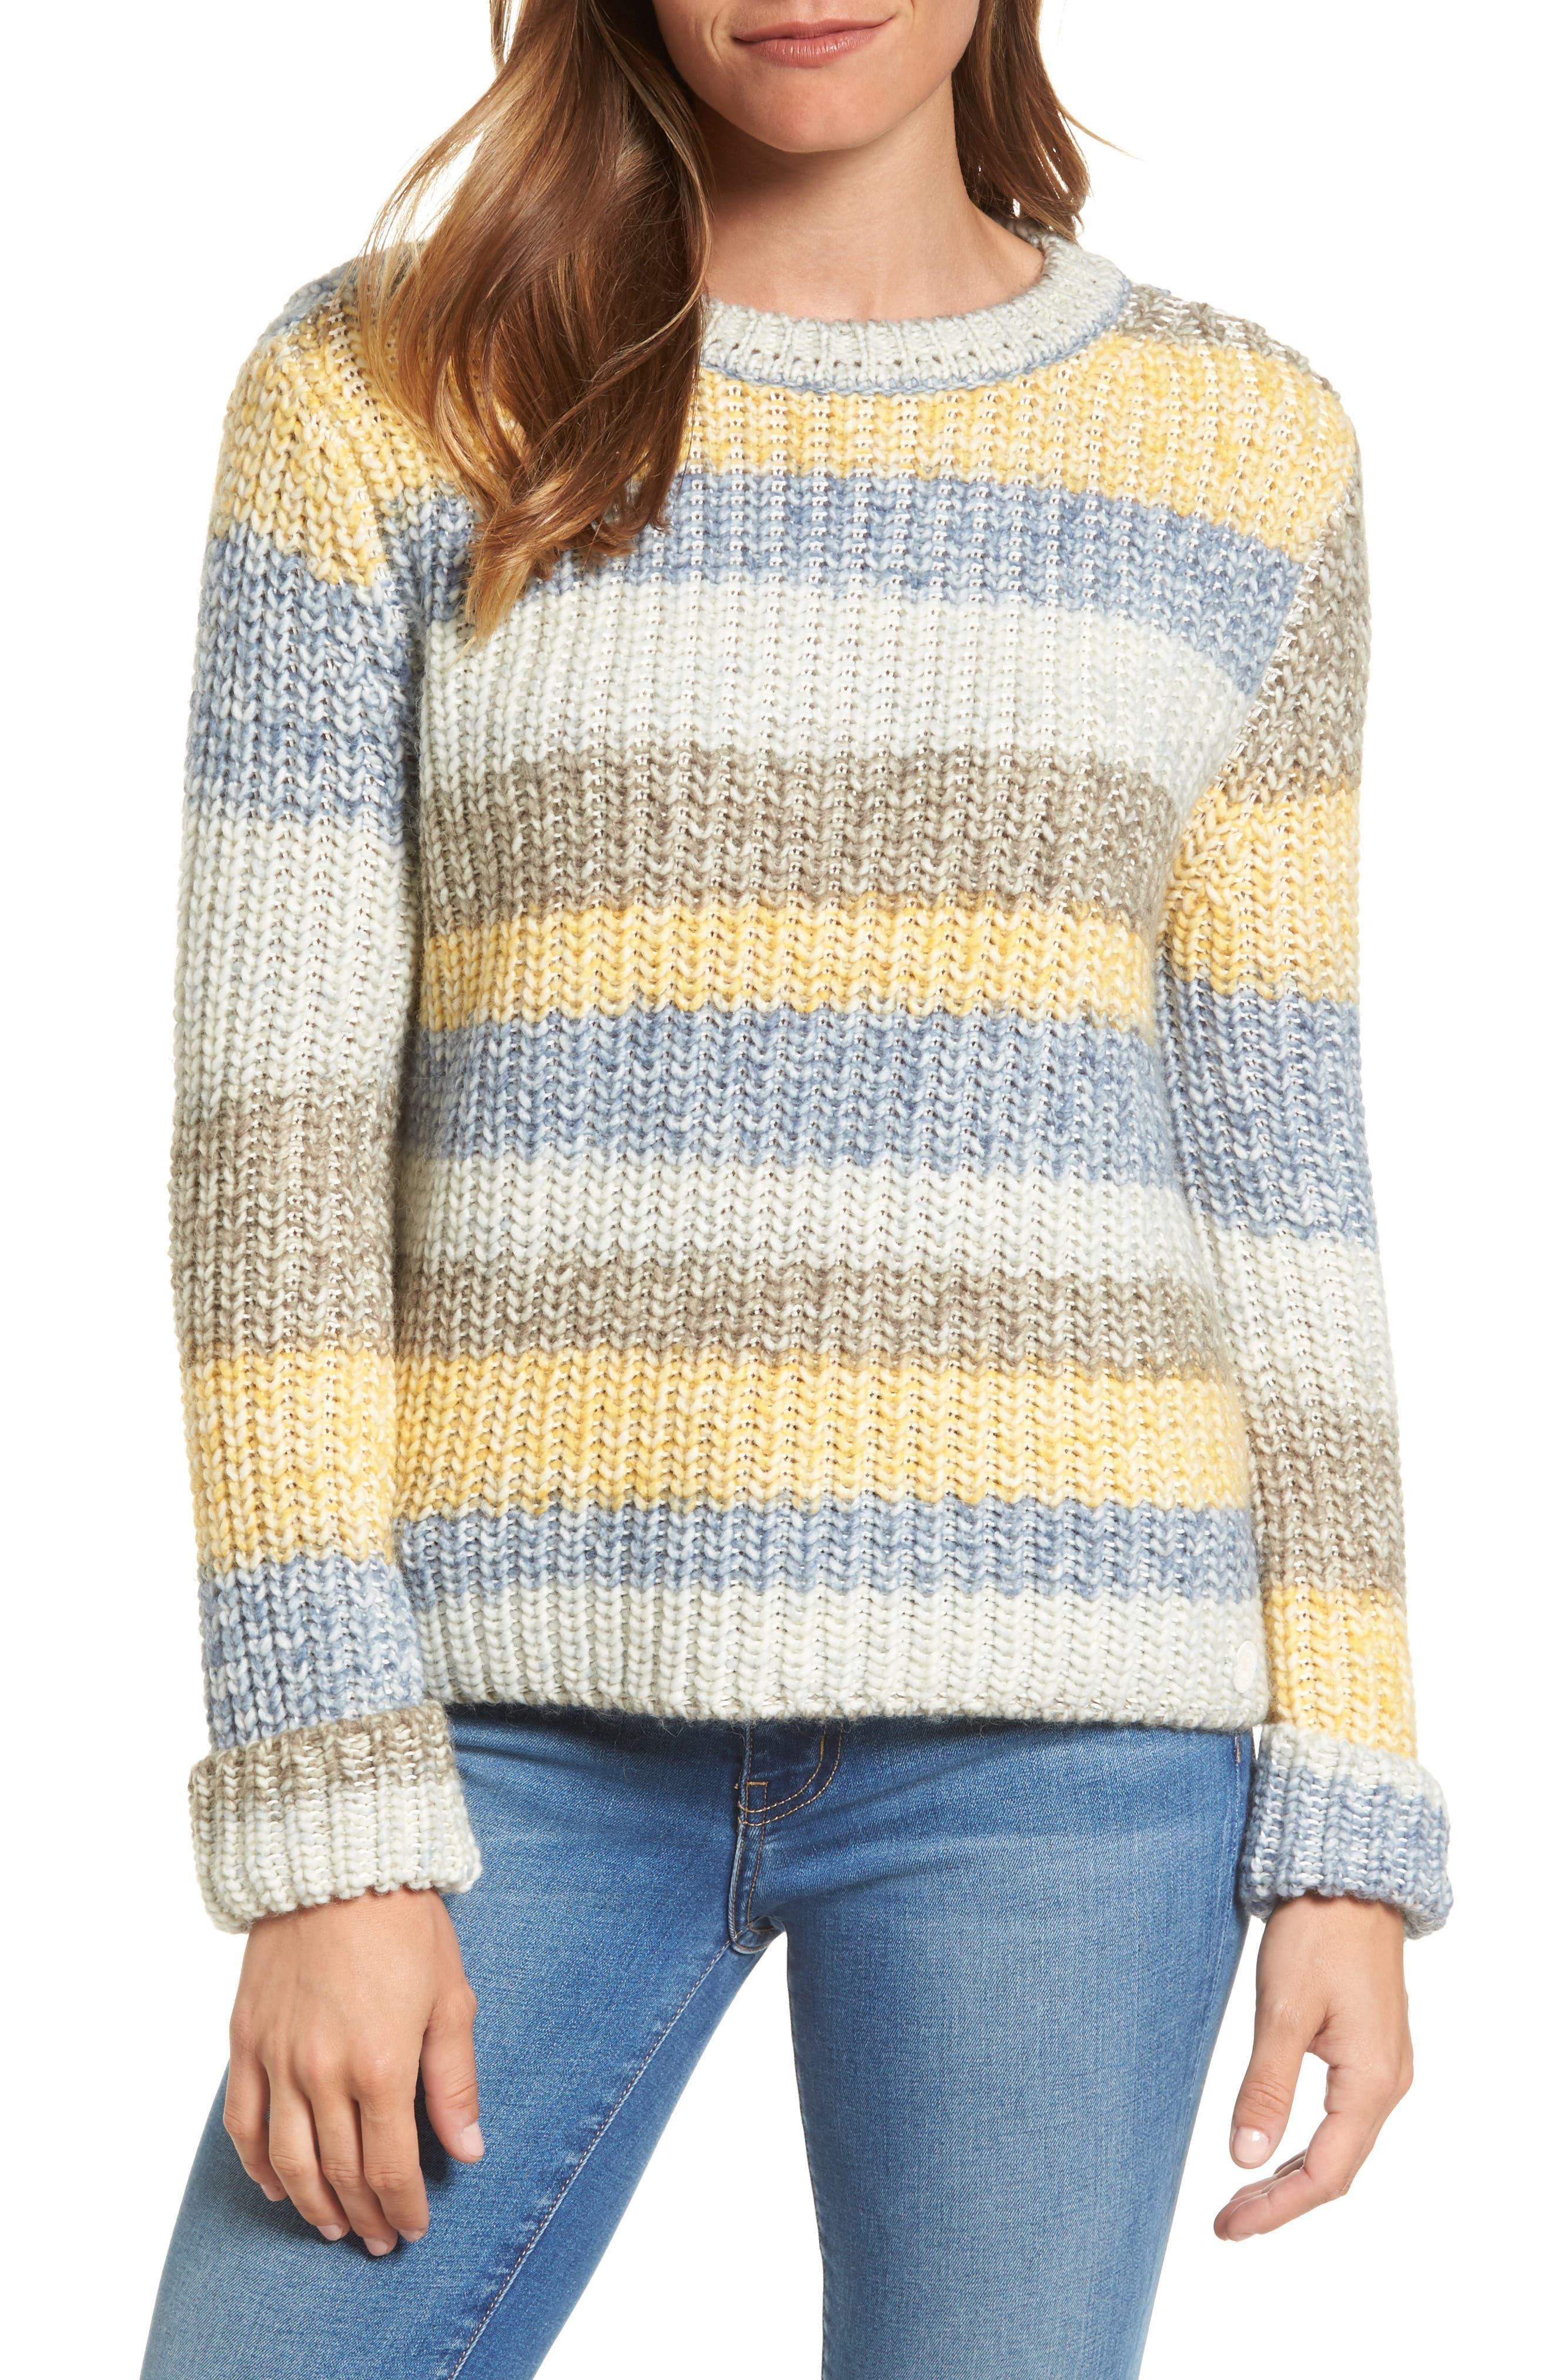 Hive Knit Fisherman Sweater,                             Main thumbnail 1, color,                             Sun Gold